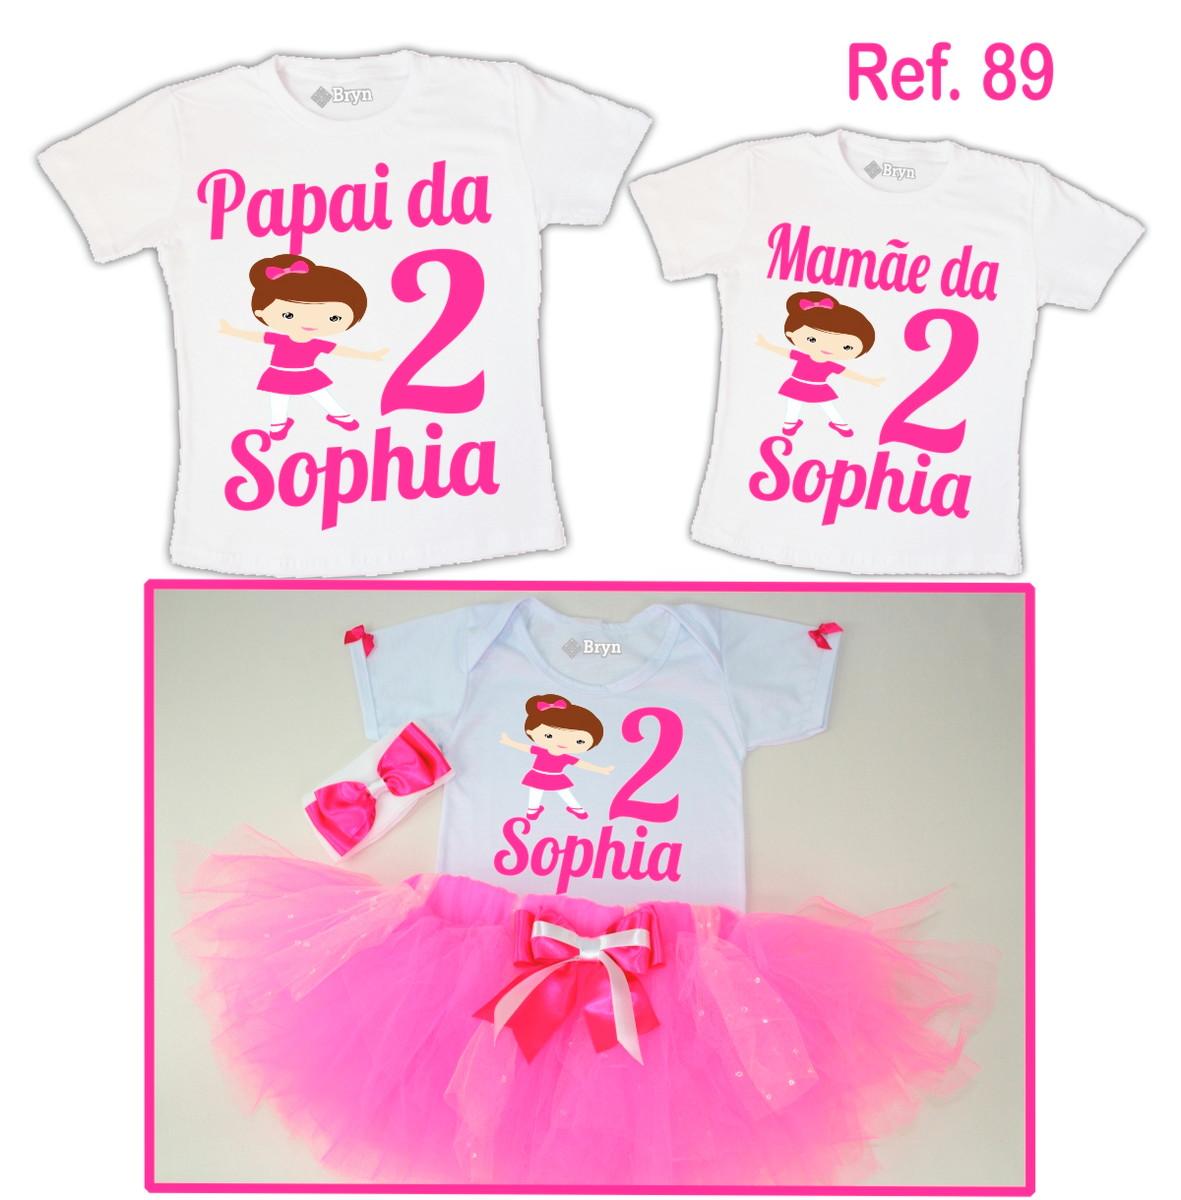 ce1664df94 Kit Fantasia Tutu Bailarina Rosa Pink + 2 Camisetas no Elo7